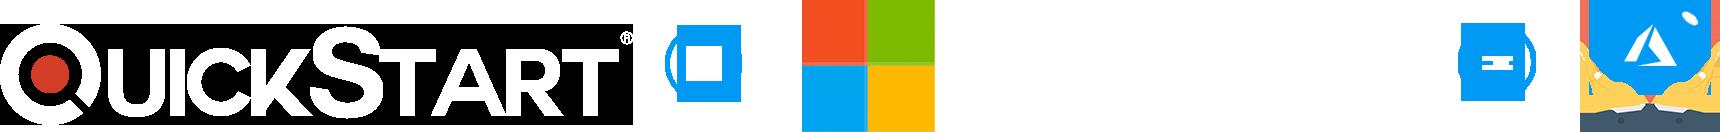 Microsoft Plus QuickStart Love